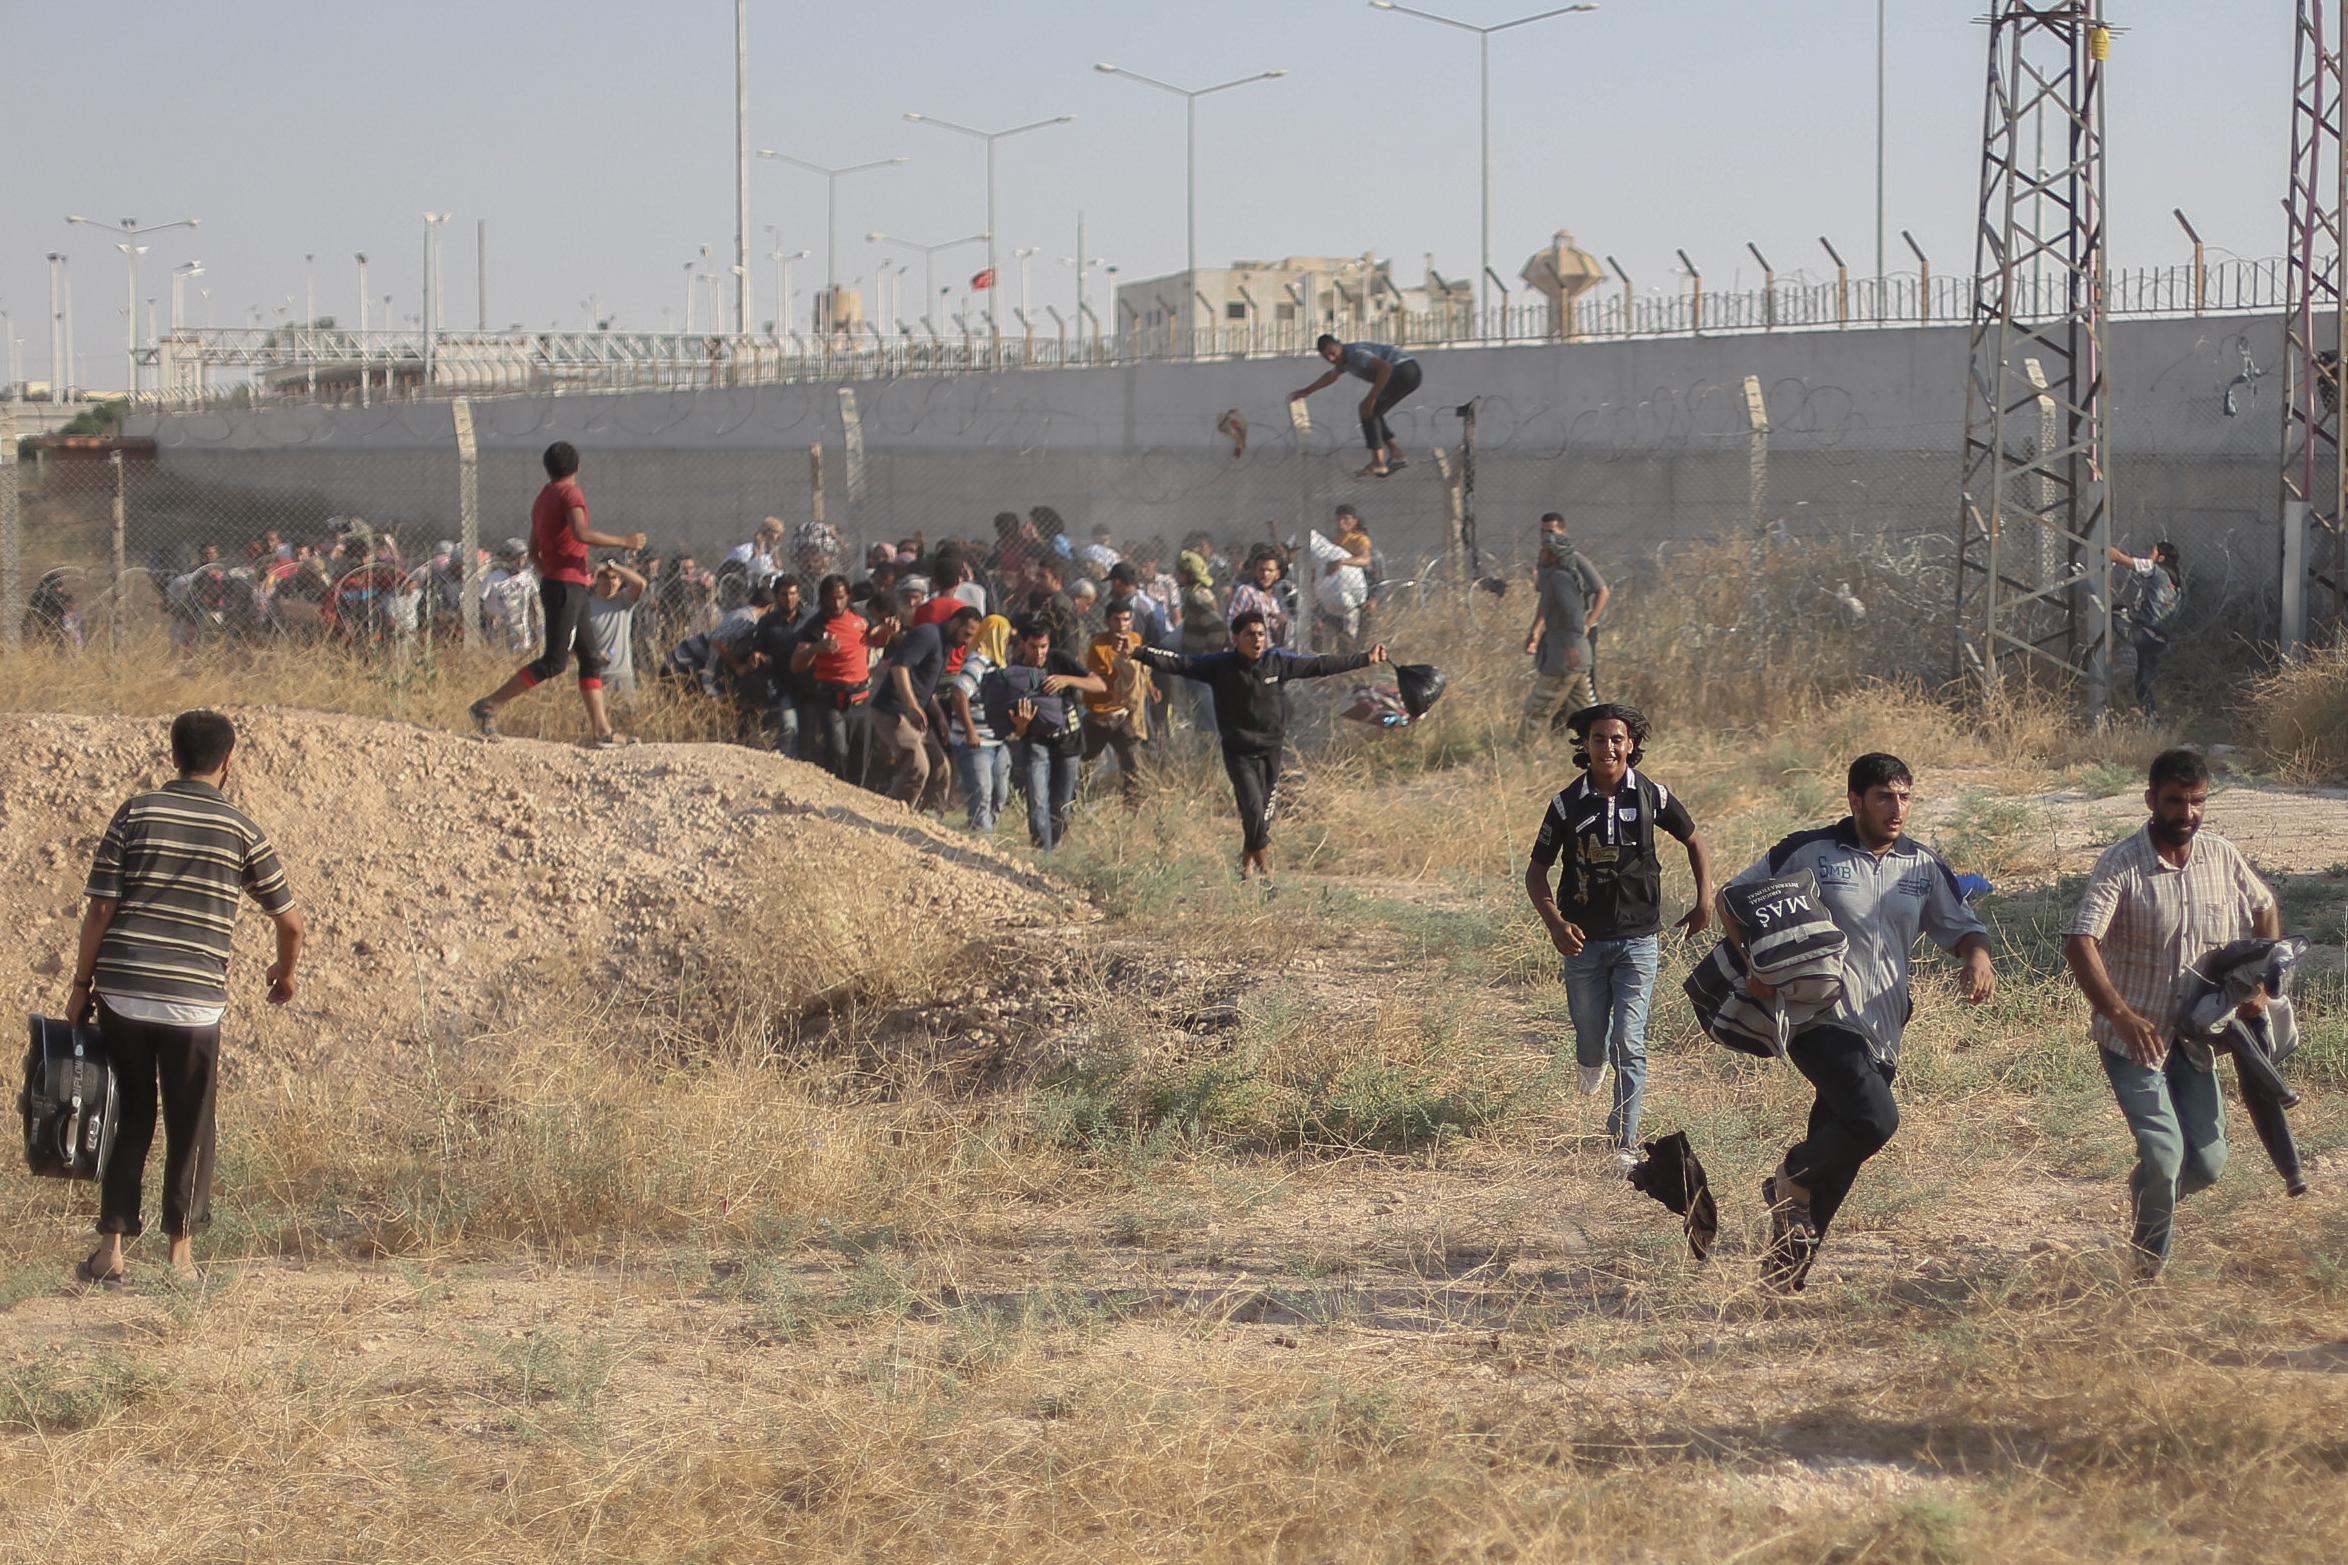 Turkish Military Shot Demonstration of Kurds in Syria & Killed Teenager